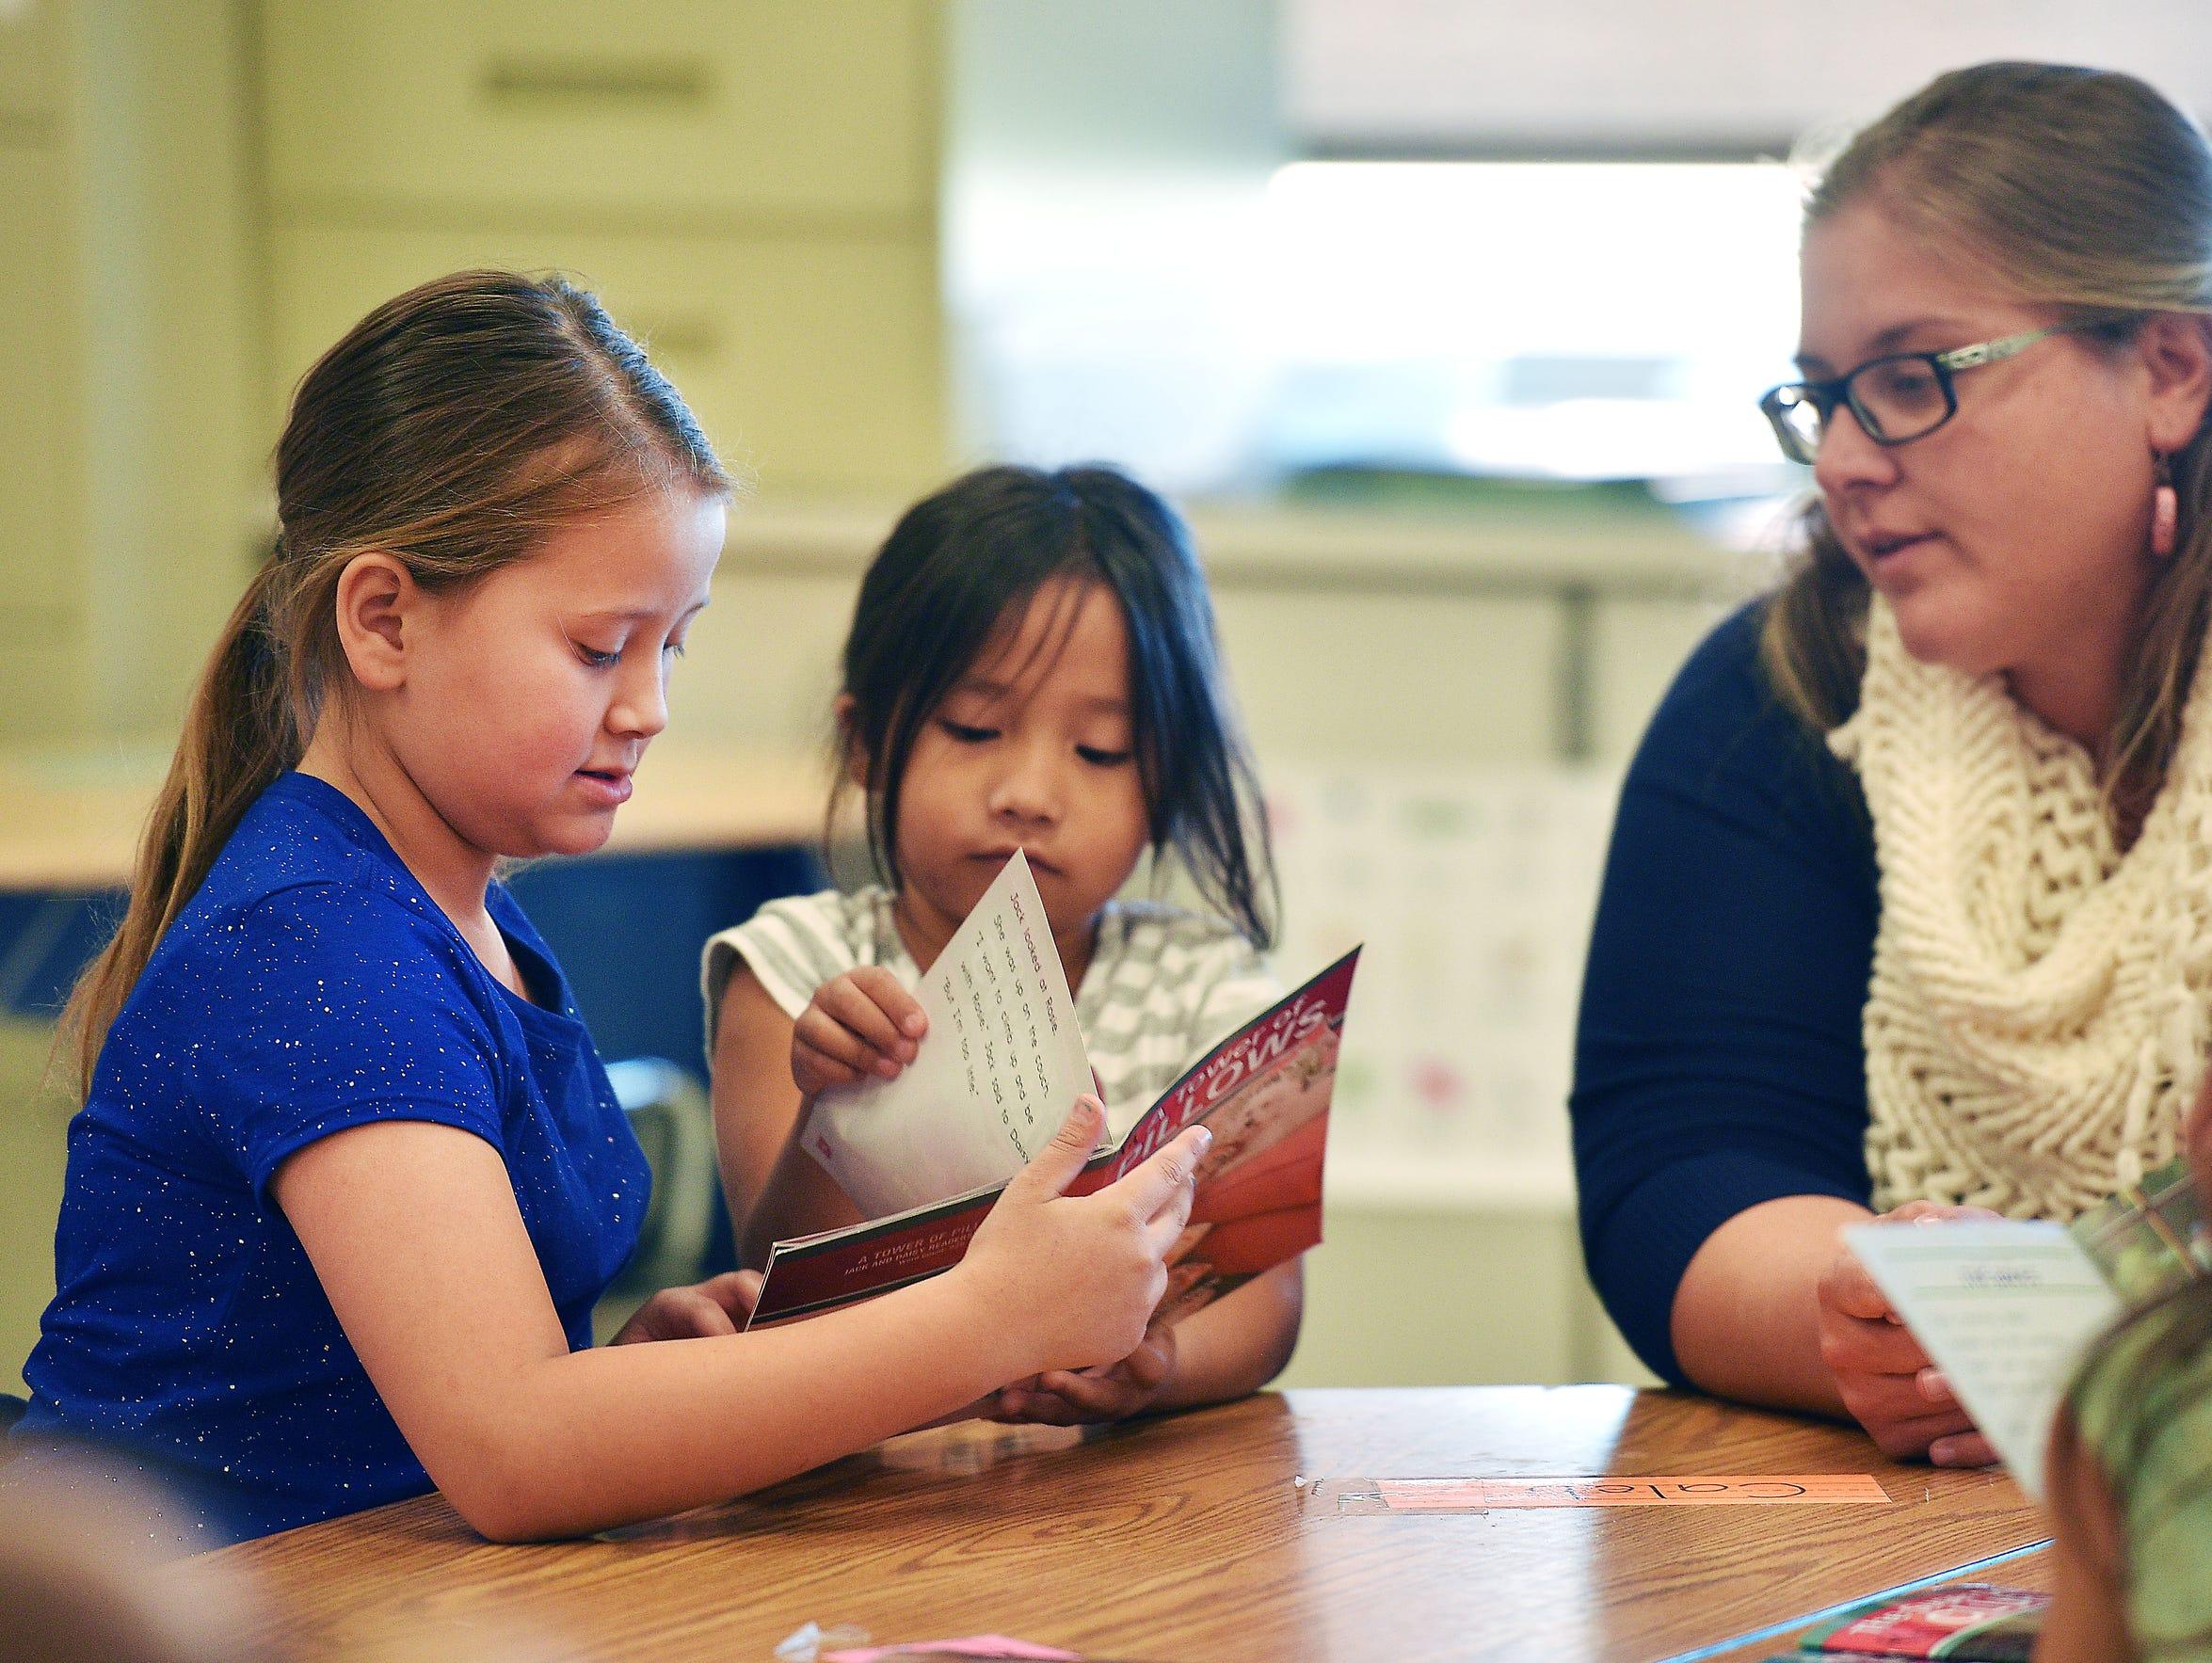 Third grader Aubrianna Haukaas, from left, reads a